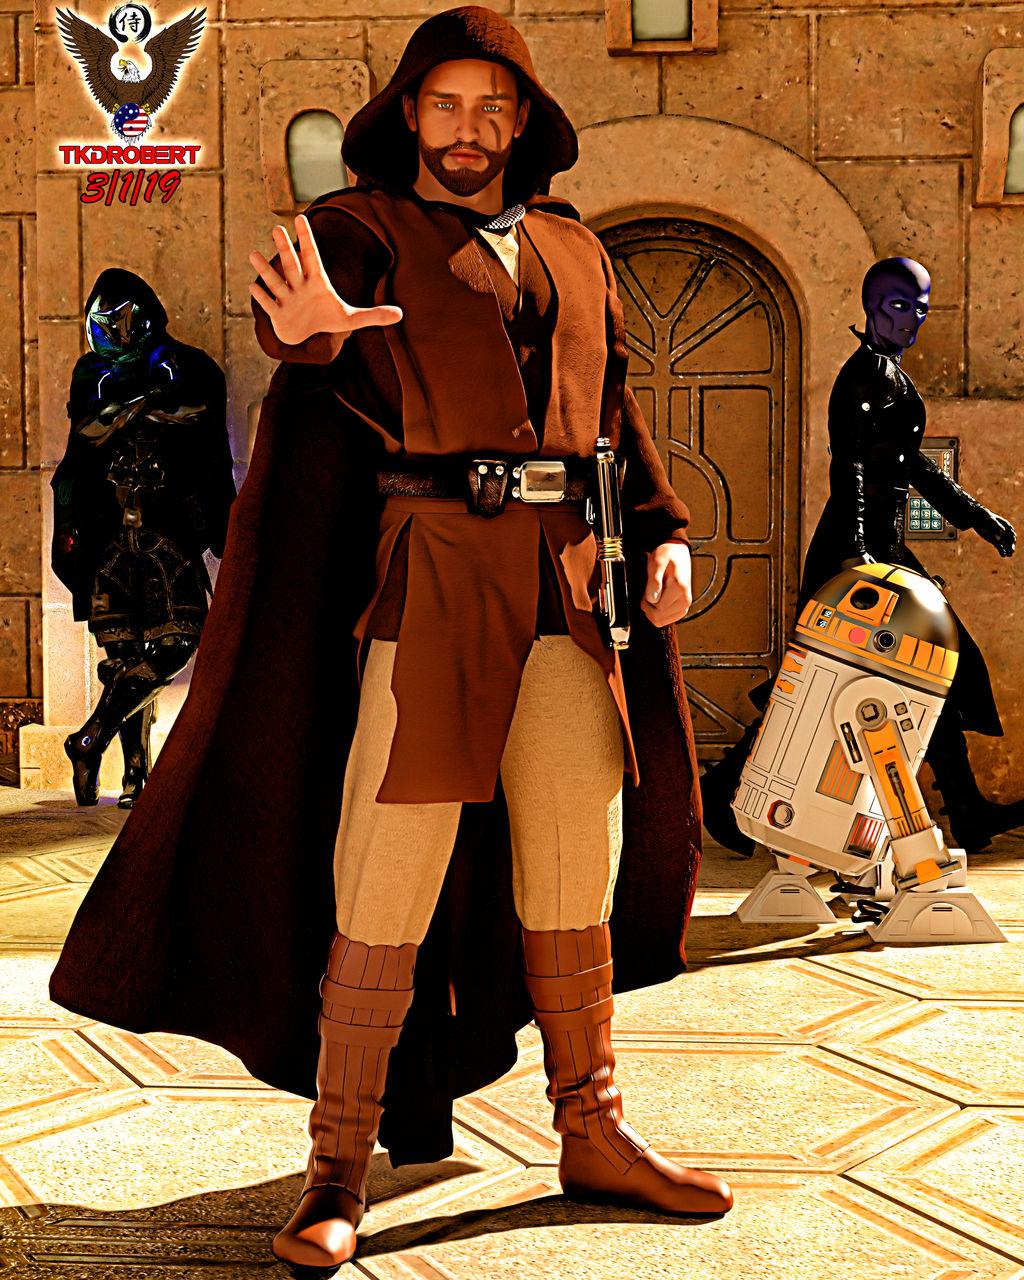 Jedi Knight Seare Hawkeye (Updated) by tkdrobert